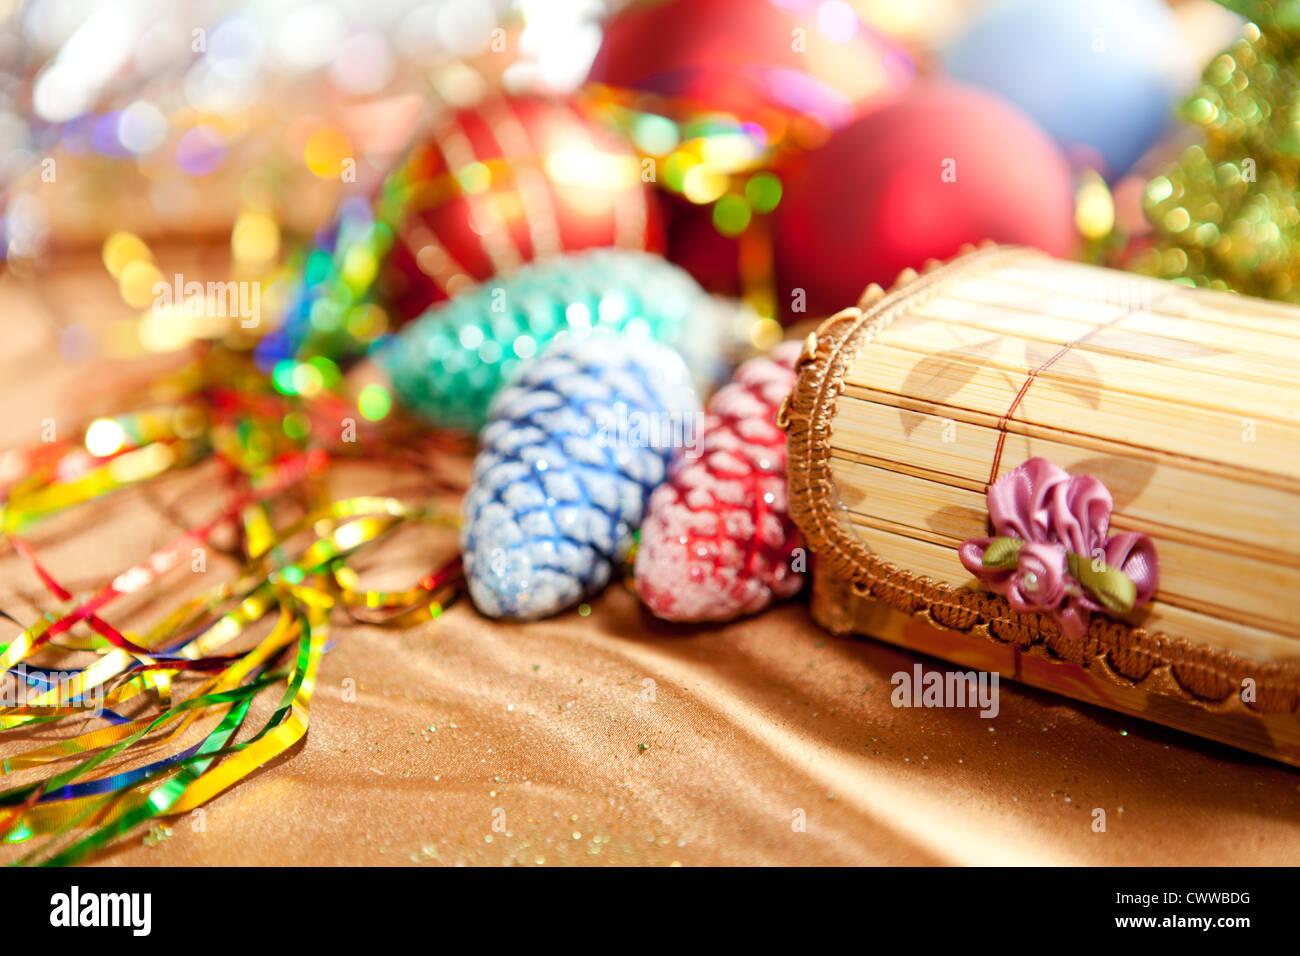 Preparing for Christmas - Stock Image